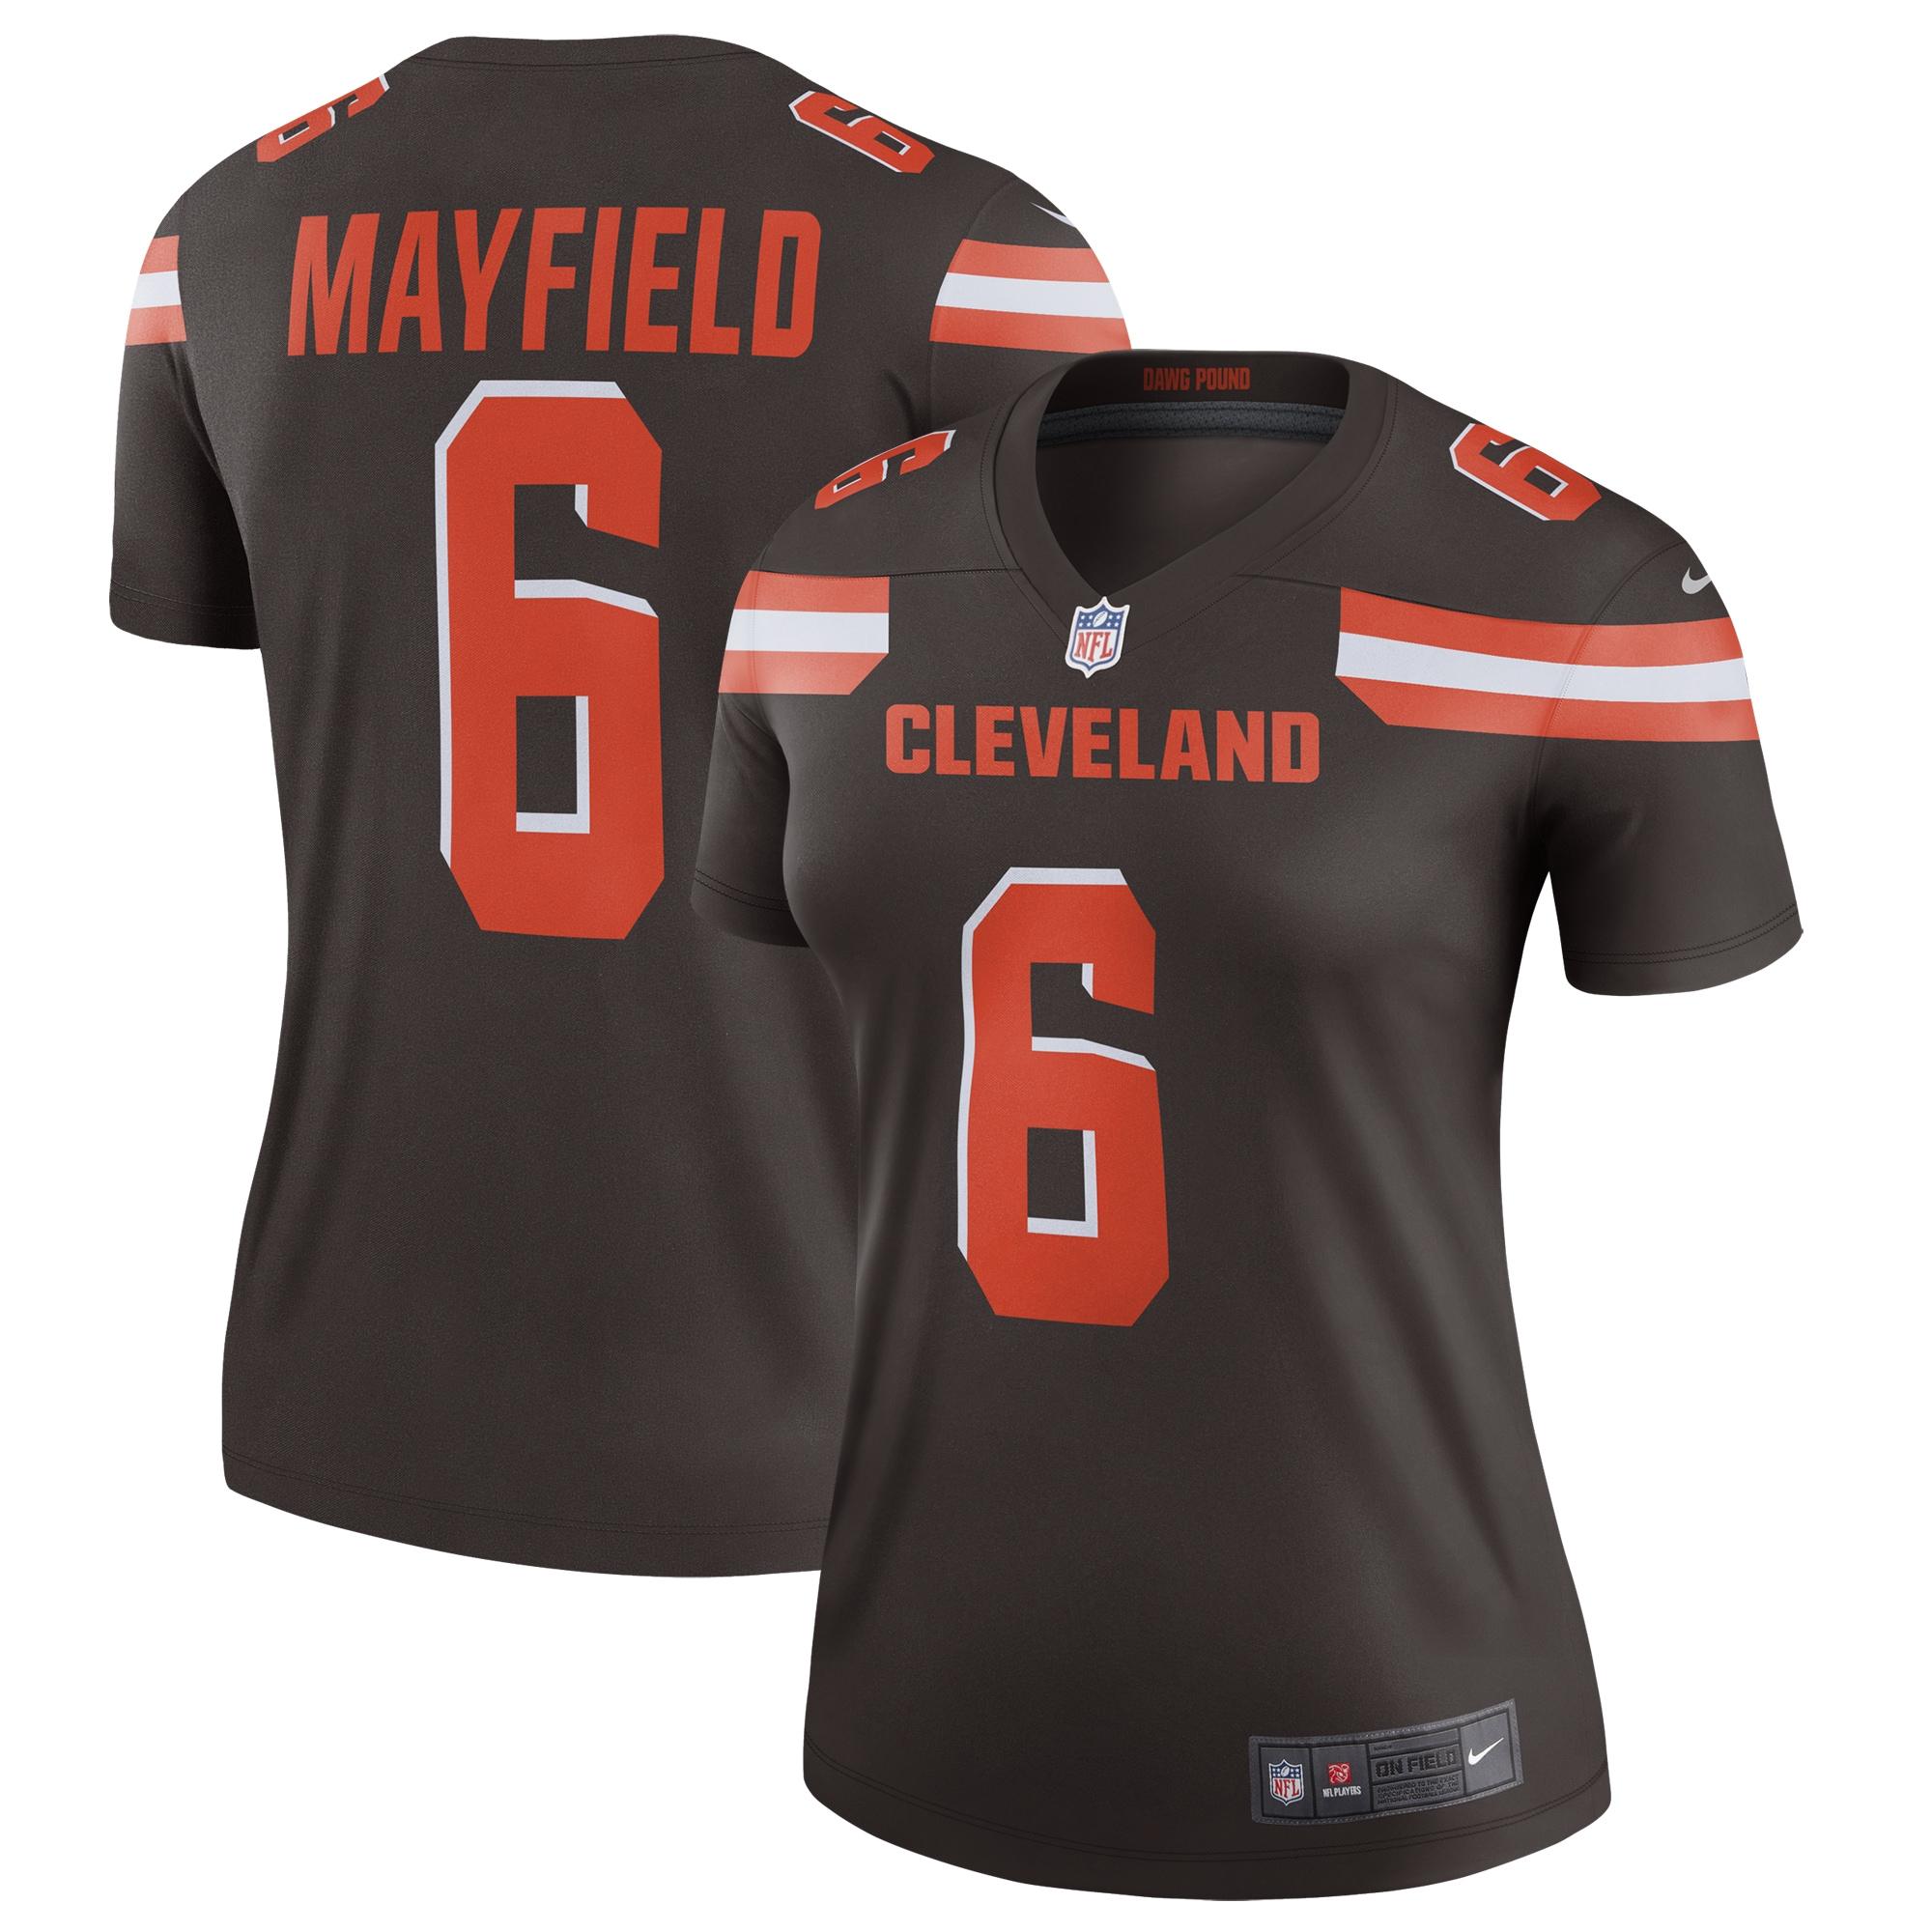 Baker Mayfield Cleveland Browns Nike Women's Legend Jersey - Brown